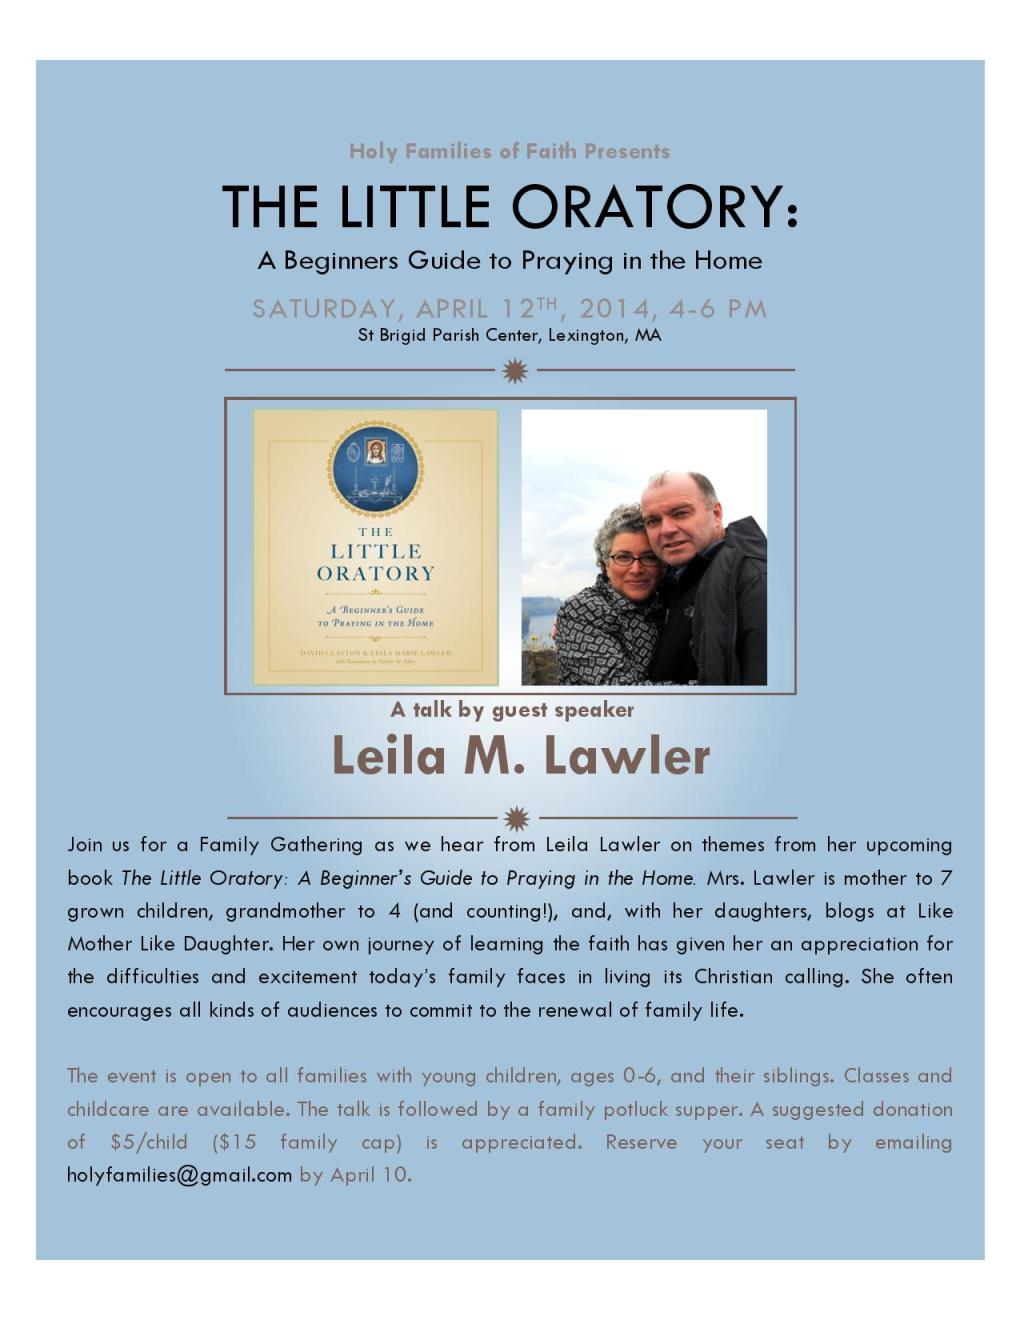 LeilaLawlerFlyerFinal-page-001